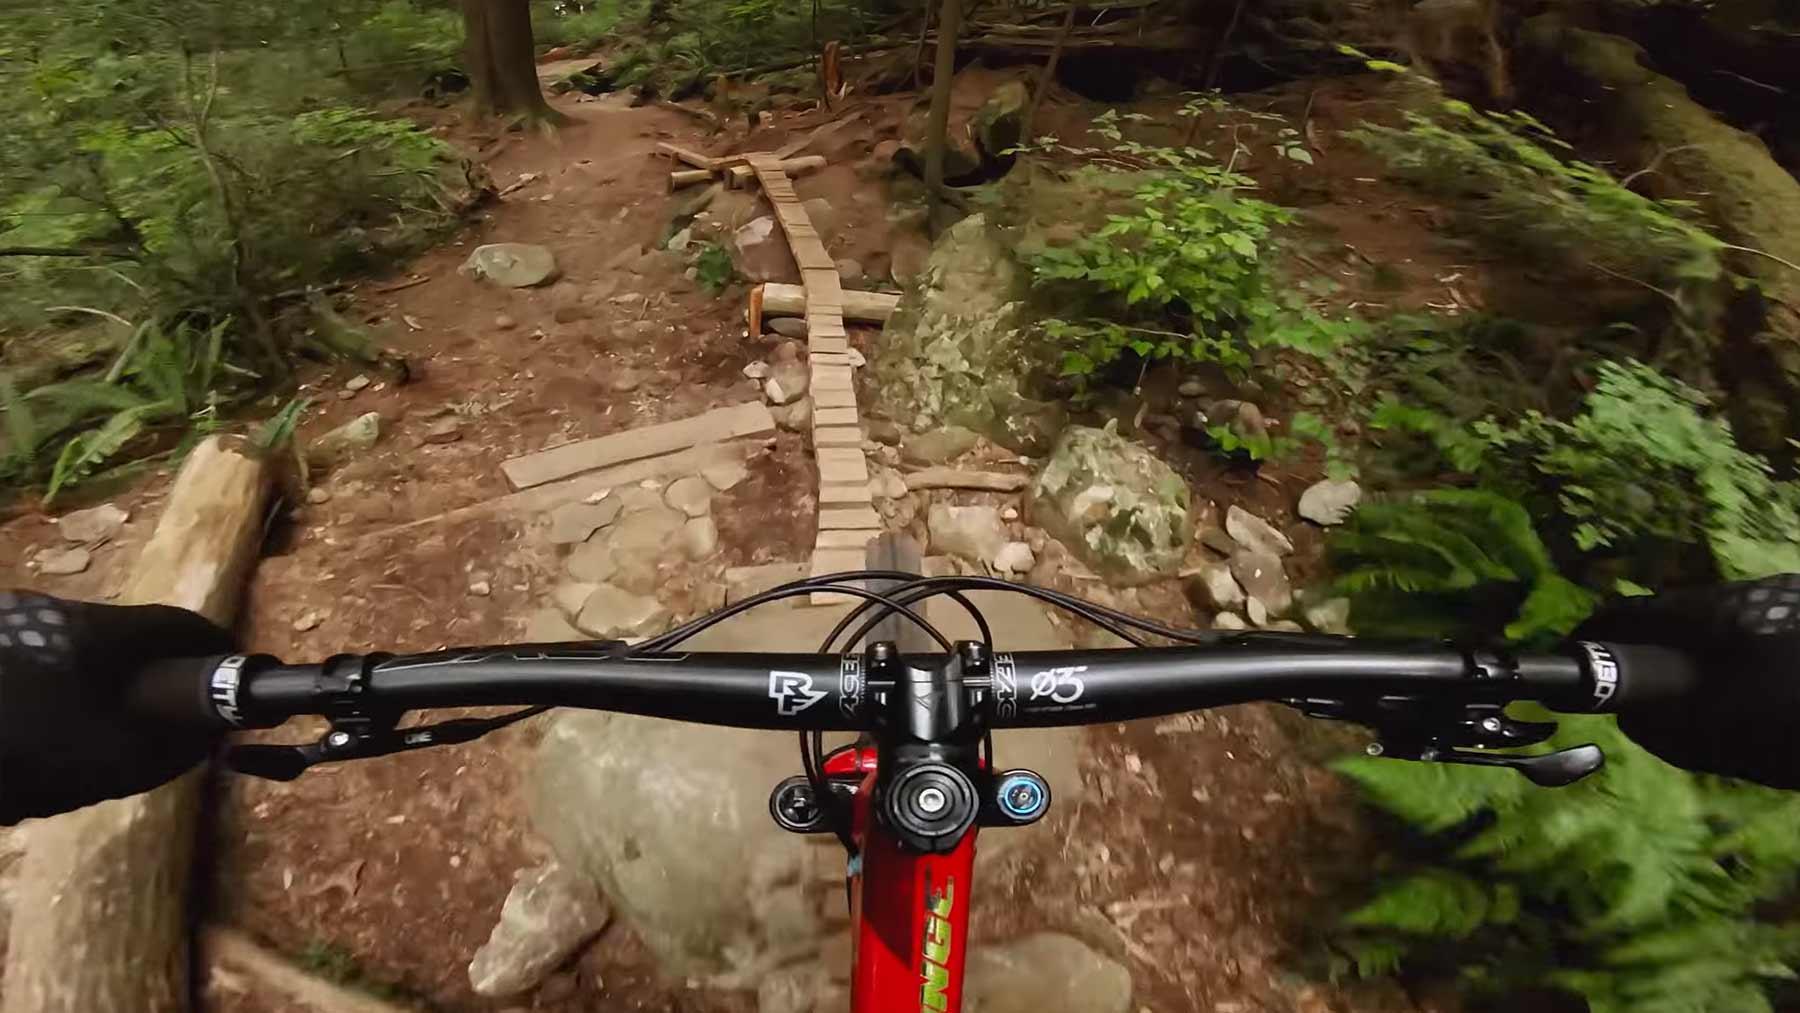 POV-Mountainbike-Fahrt durch den Wald